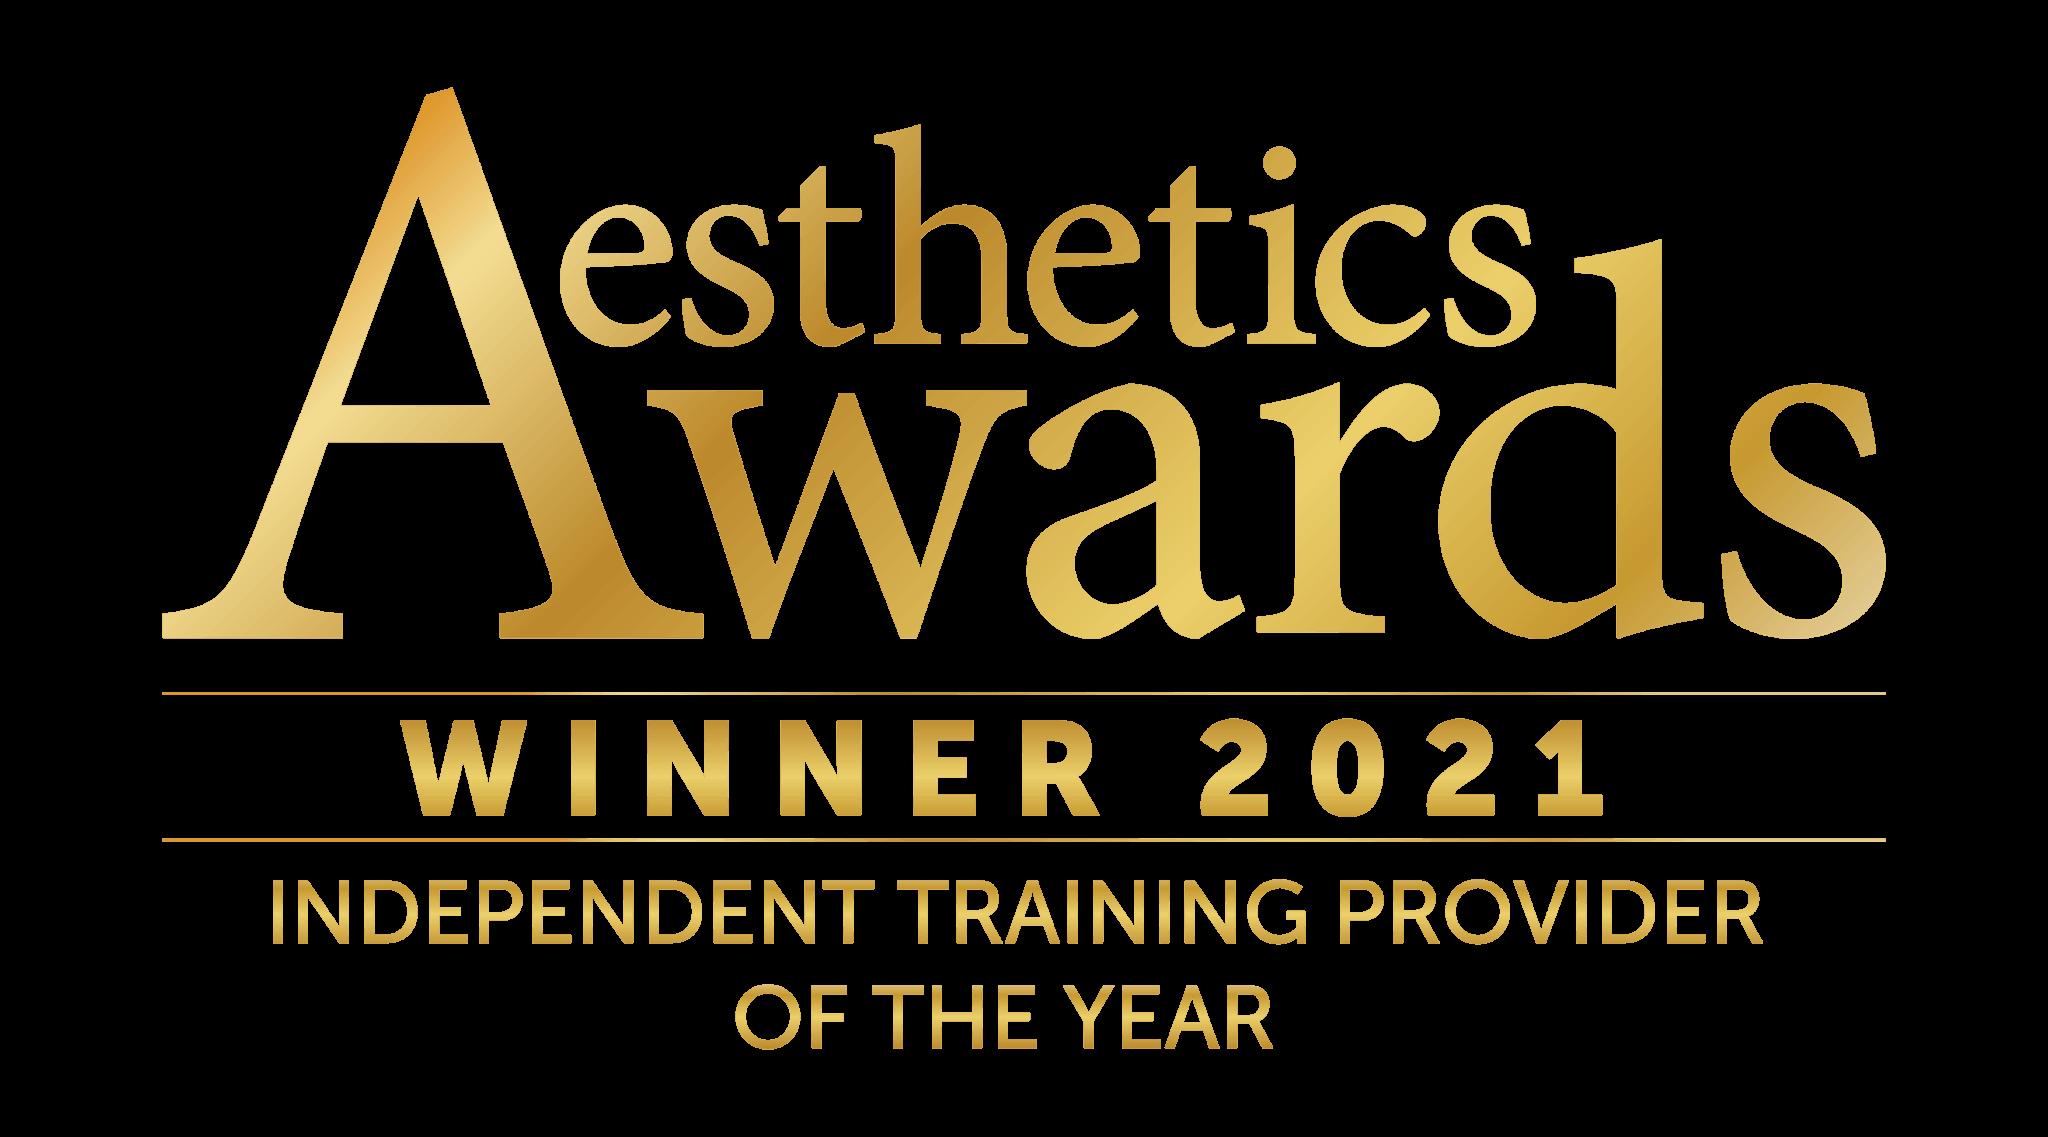 Aesthetics Awards 2021 Winner Best Independent Training Provider. Logo.